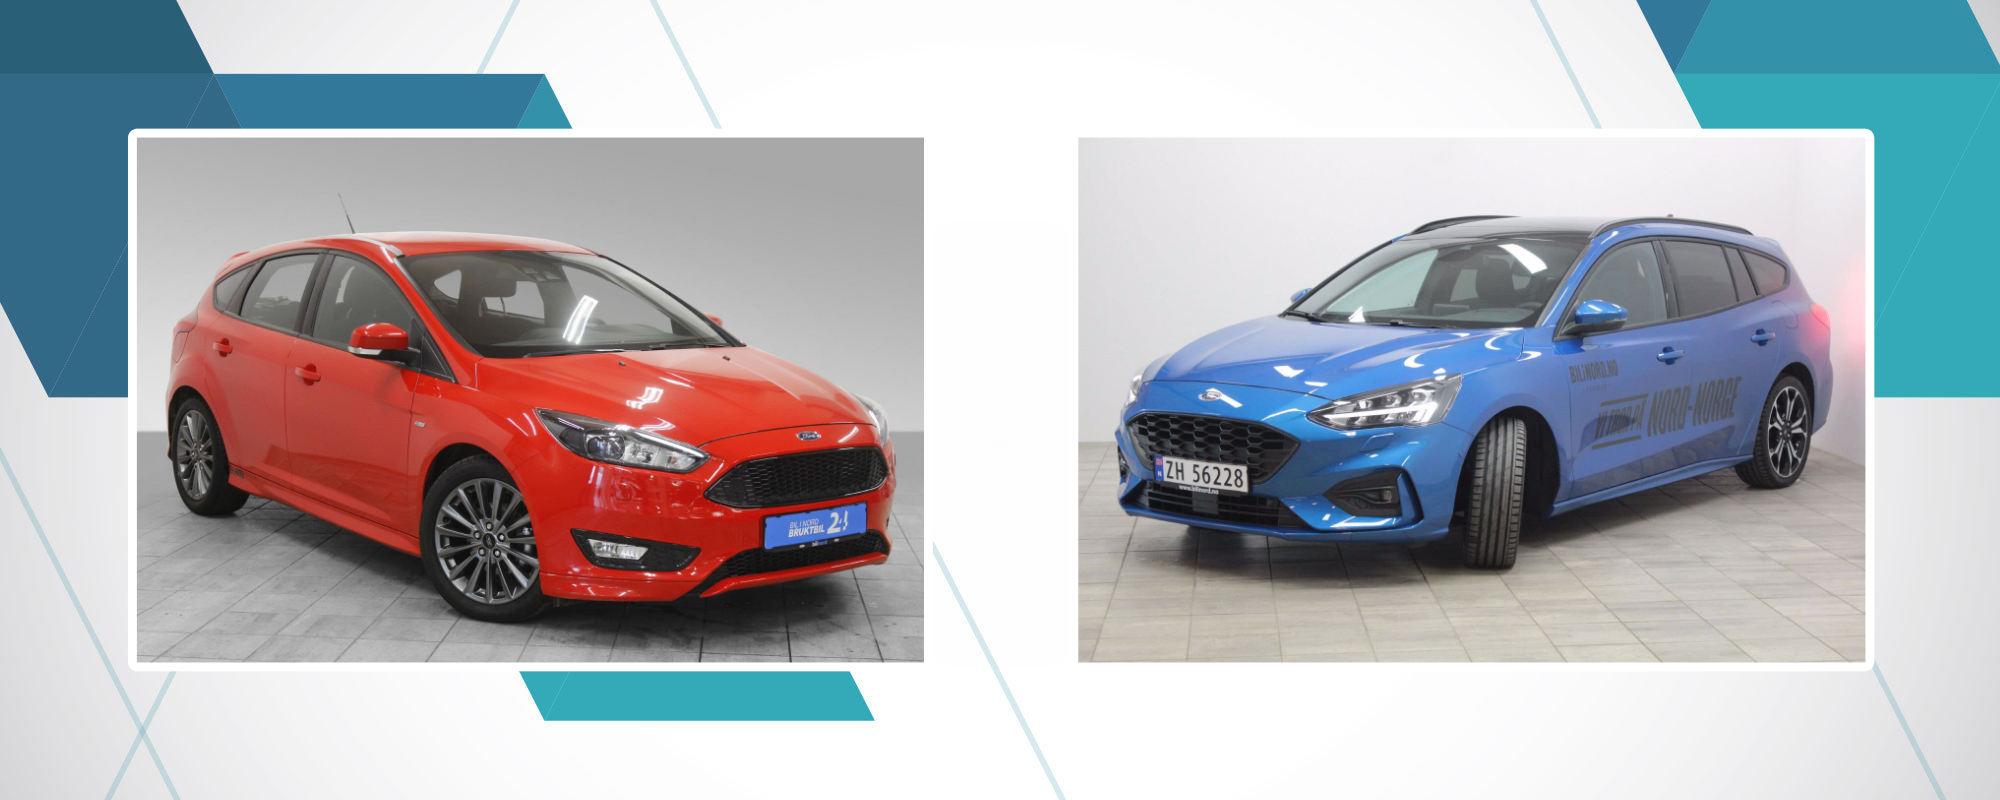 Bil i Nord - Fiesta & Focus bruktbil